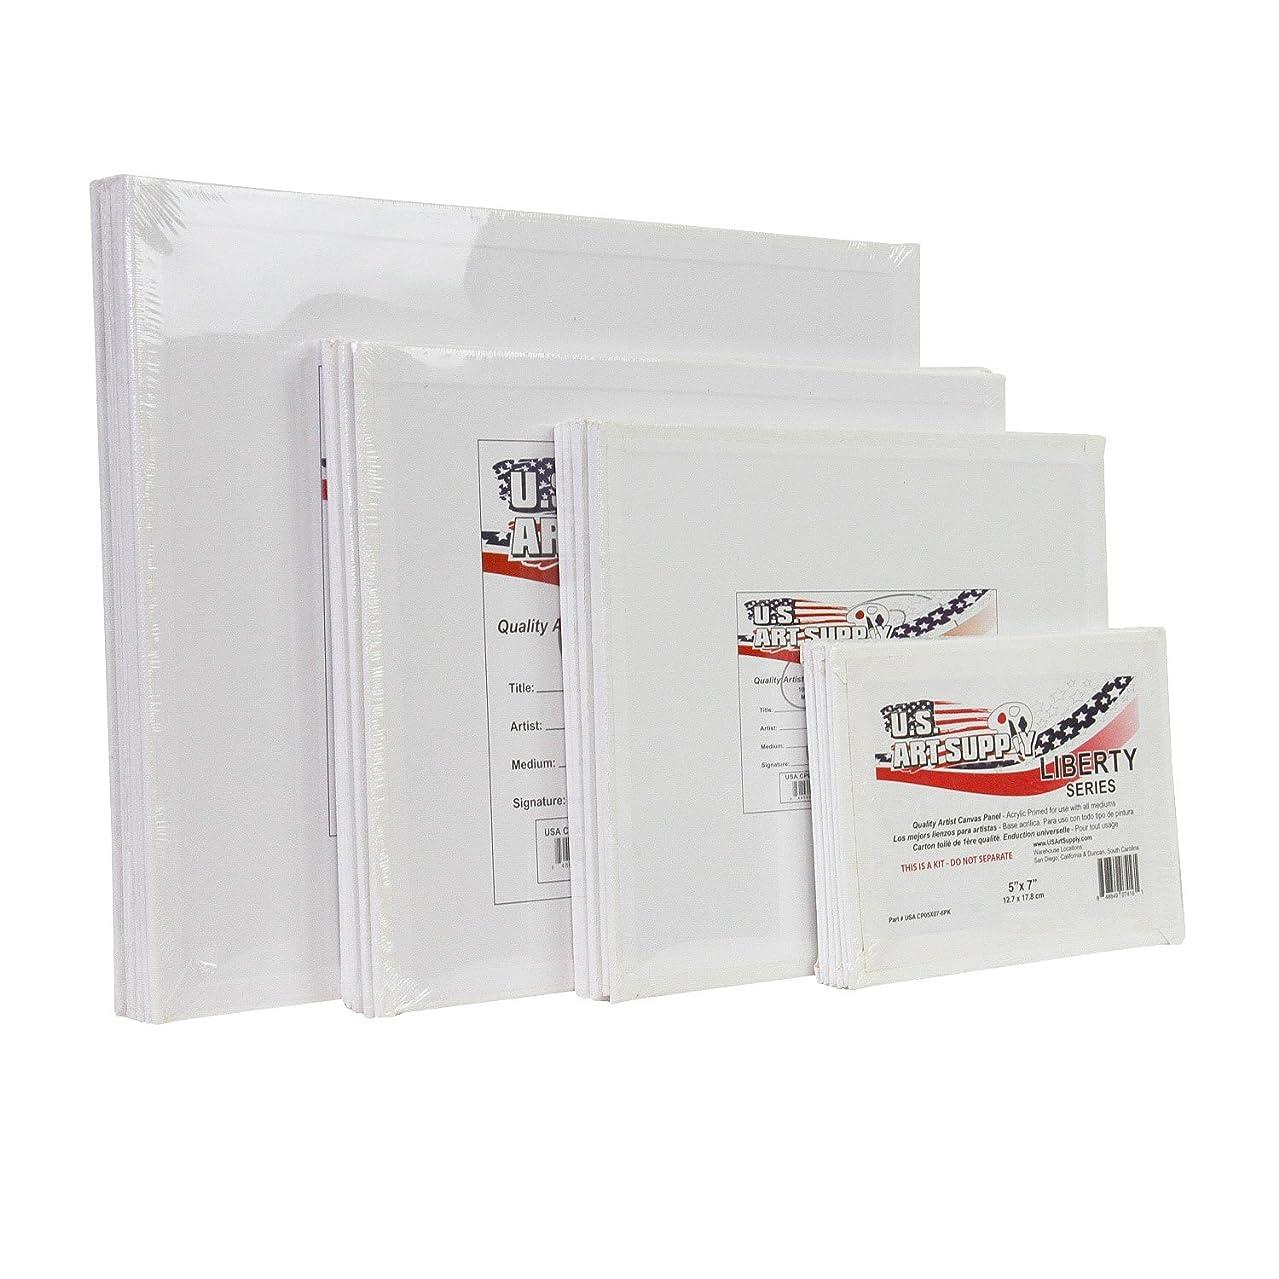 US Art Supply Multi-pack 6-Ea of 5 x 7, 8 x 10, 9 x 12, 11 x 14 inch. Professional Quality Medium Artist Canvas Panel Assortment Pack (24 Total Panels)